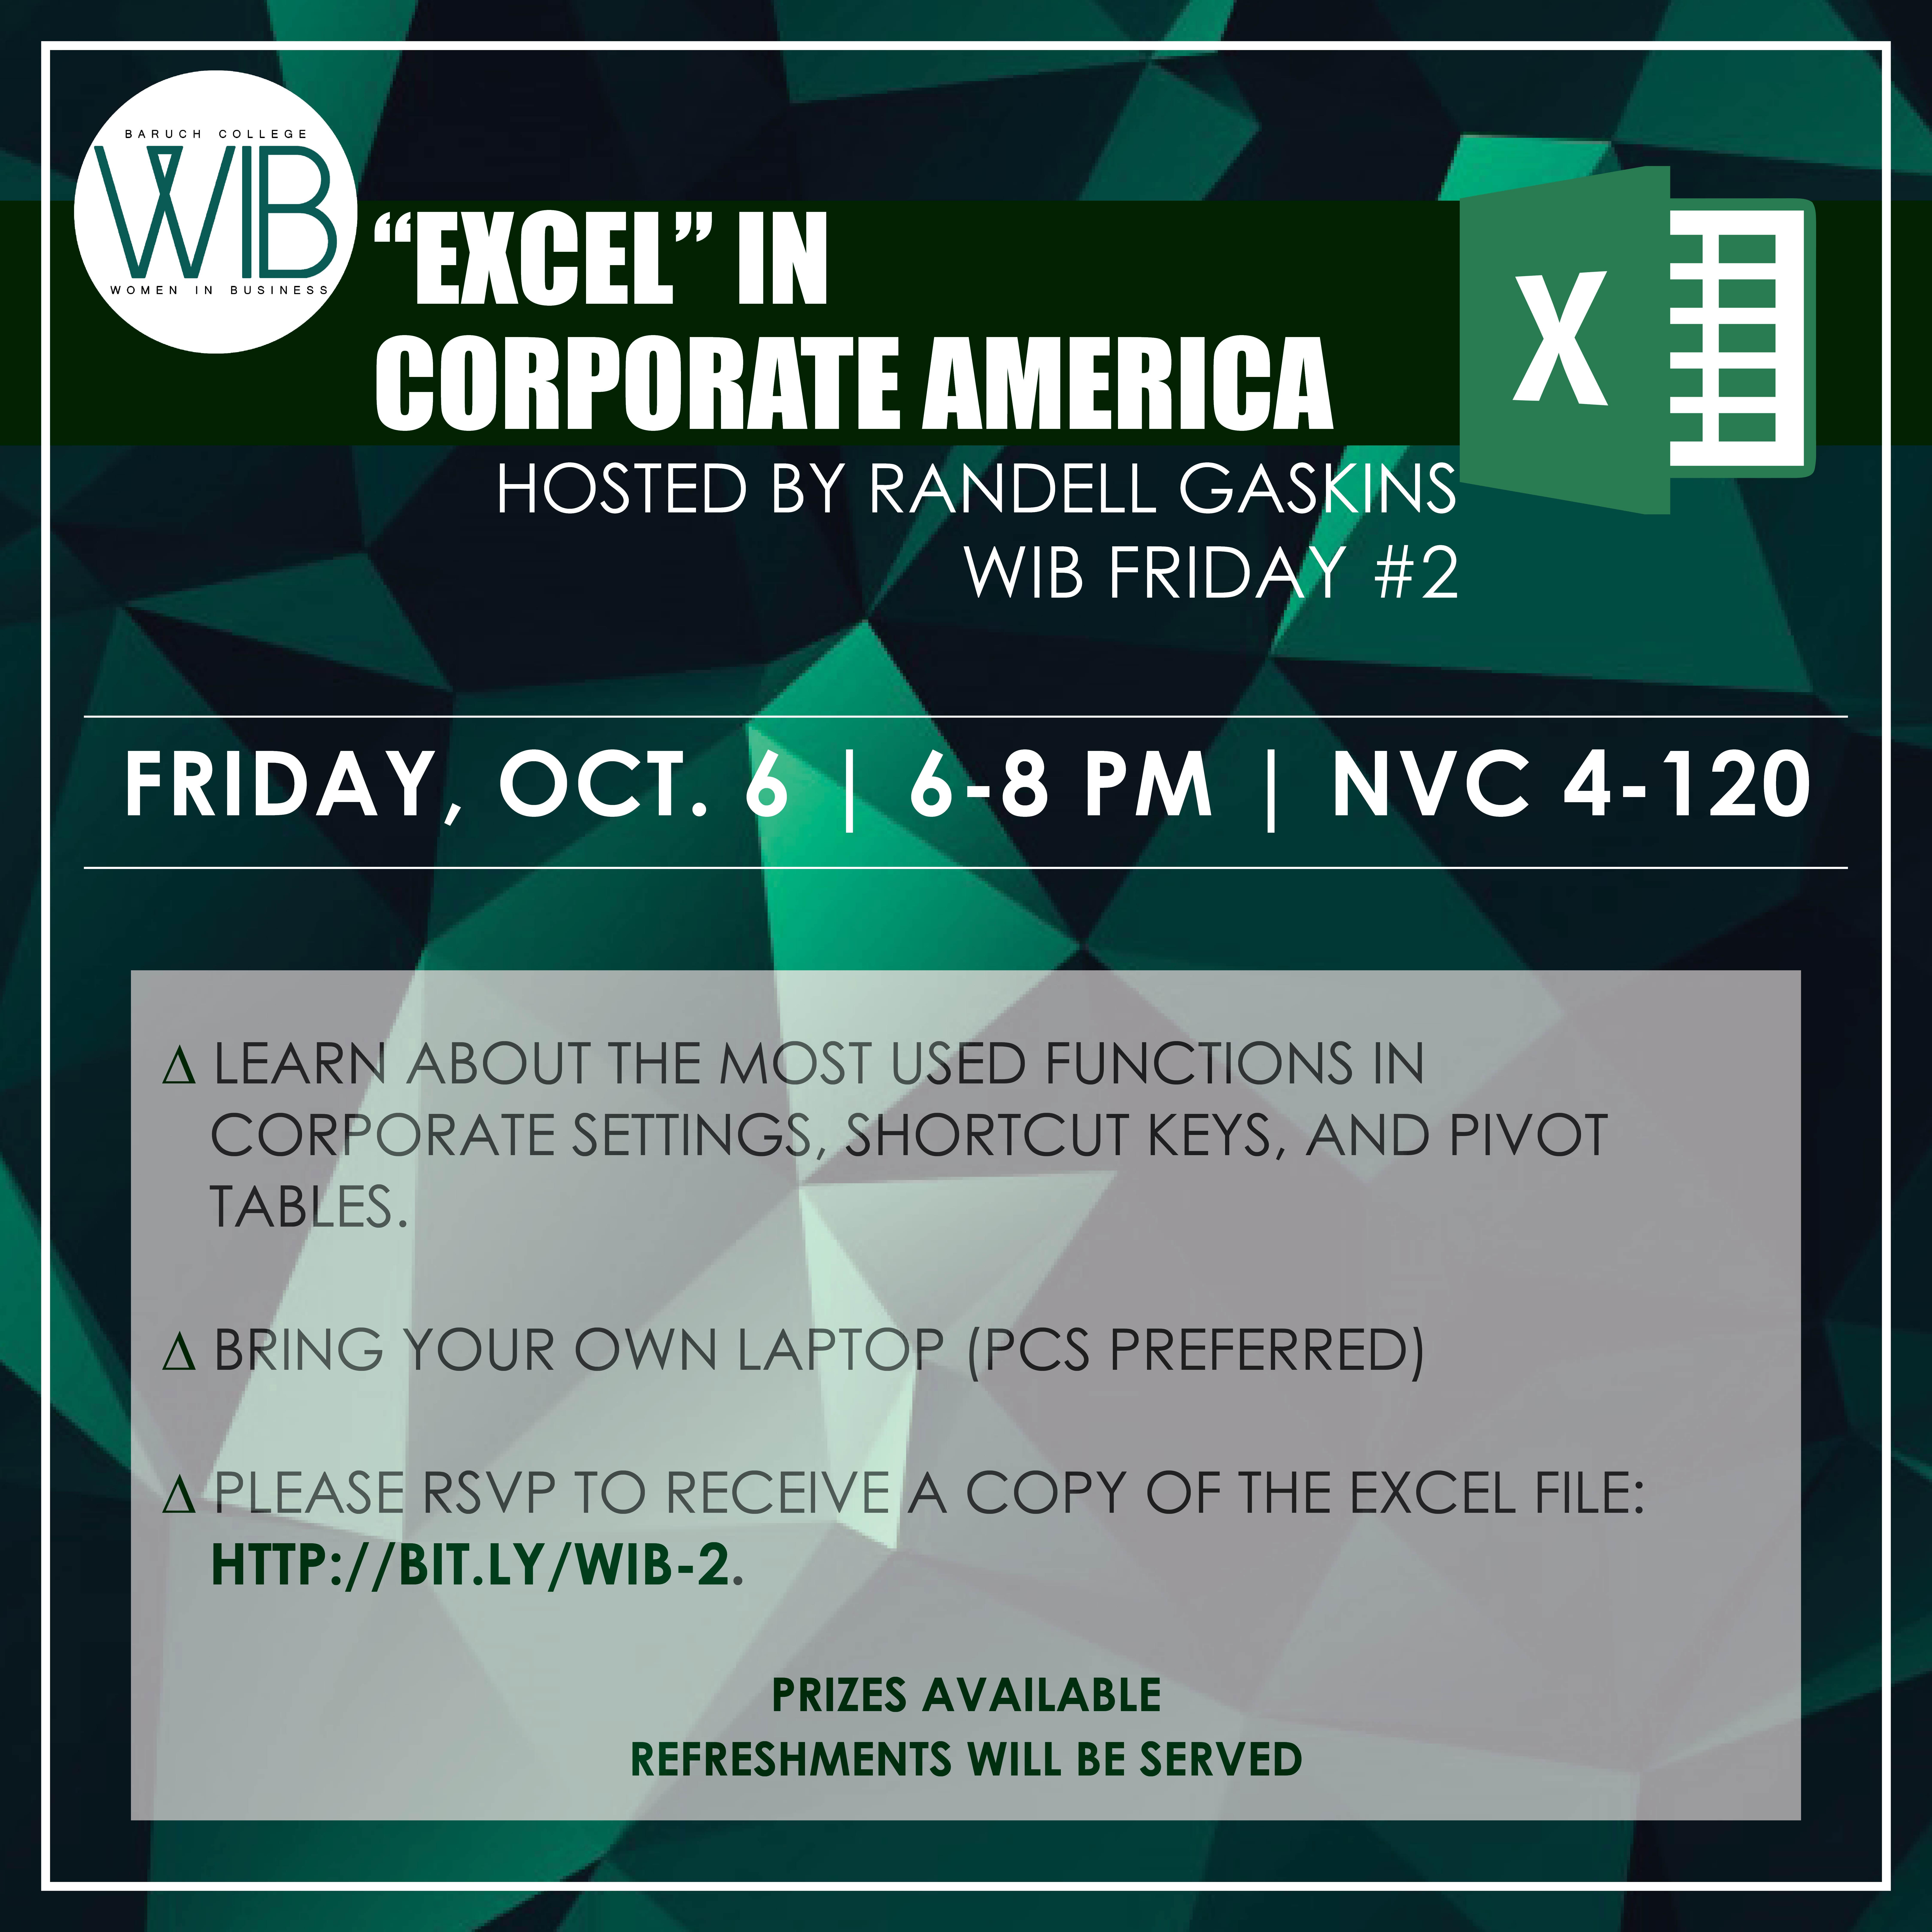 Excel in Corporate America